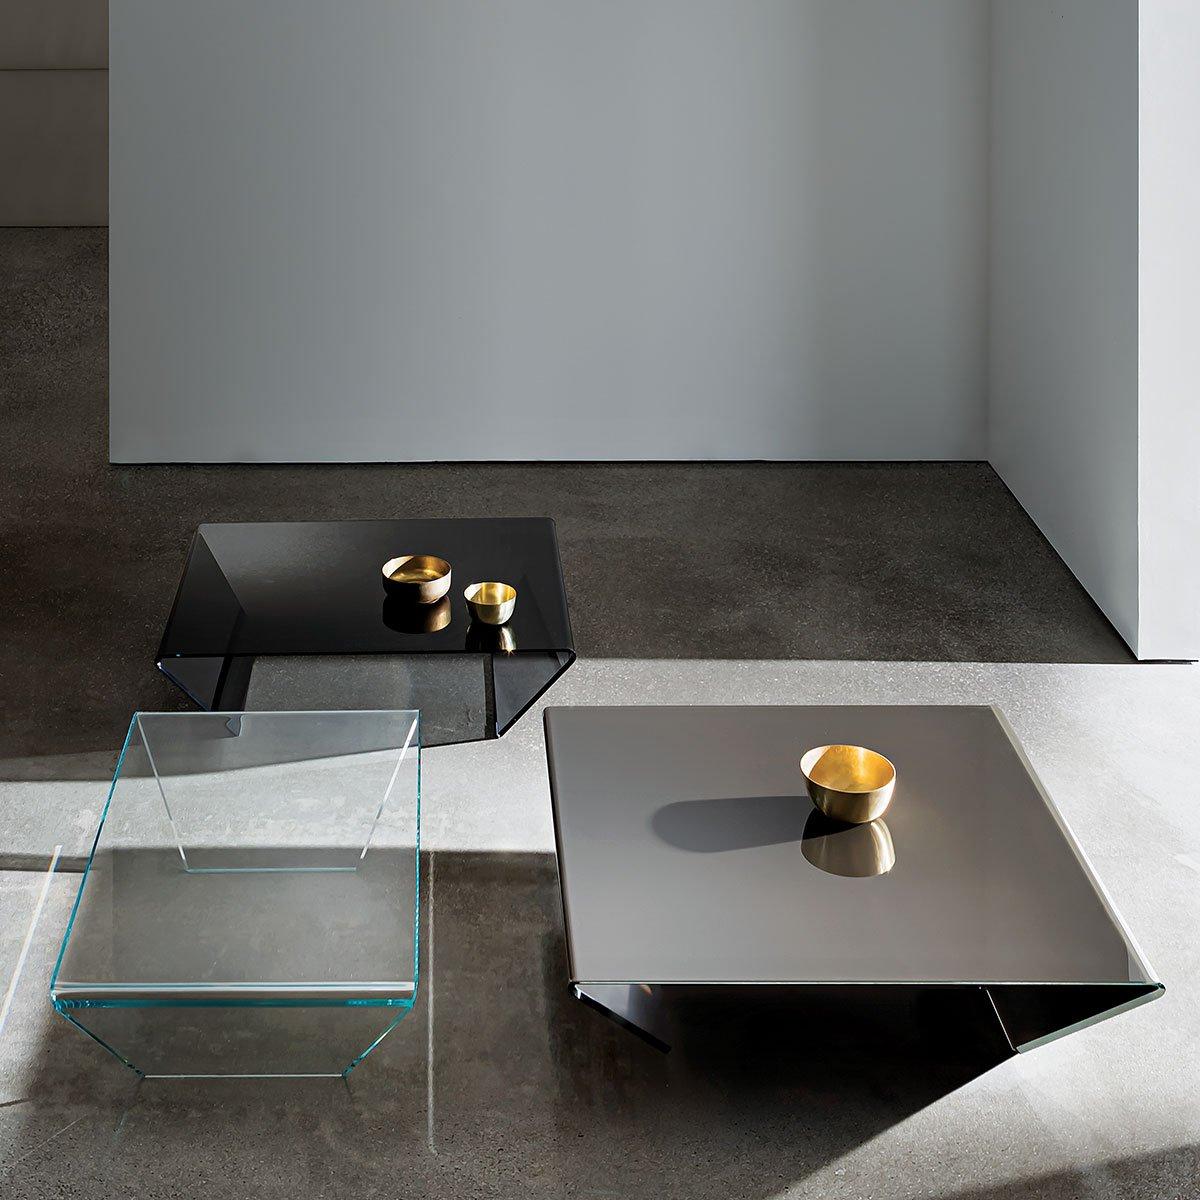 rubino curved glass coffee table